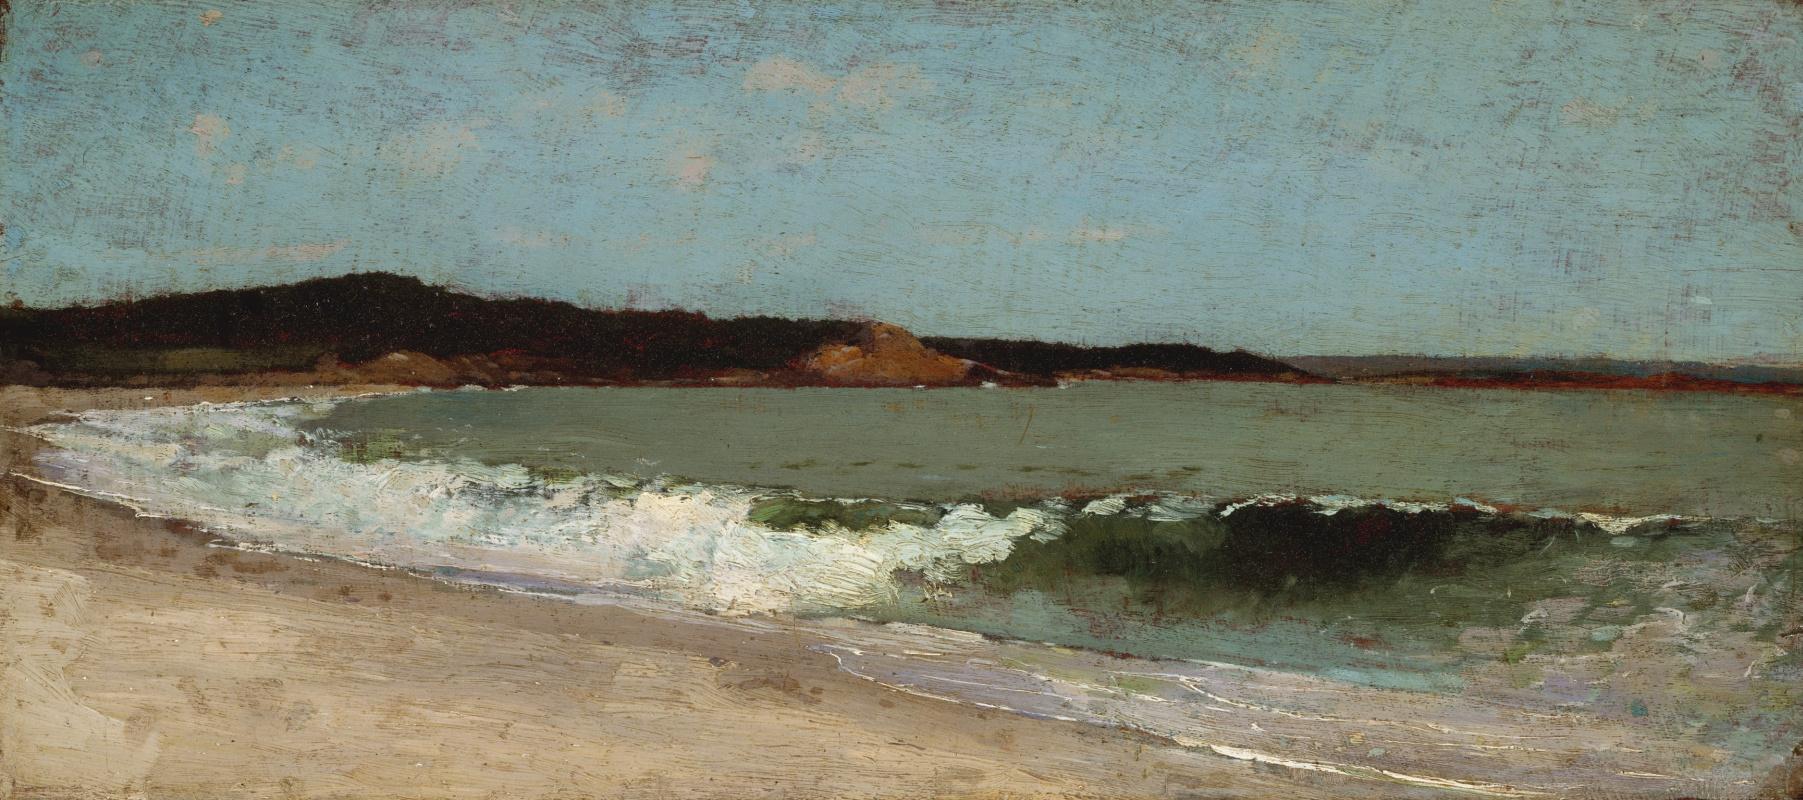 Winslow Homer. Eagle head, Manchester, Massachusetts. Sketch